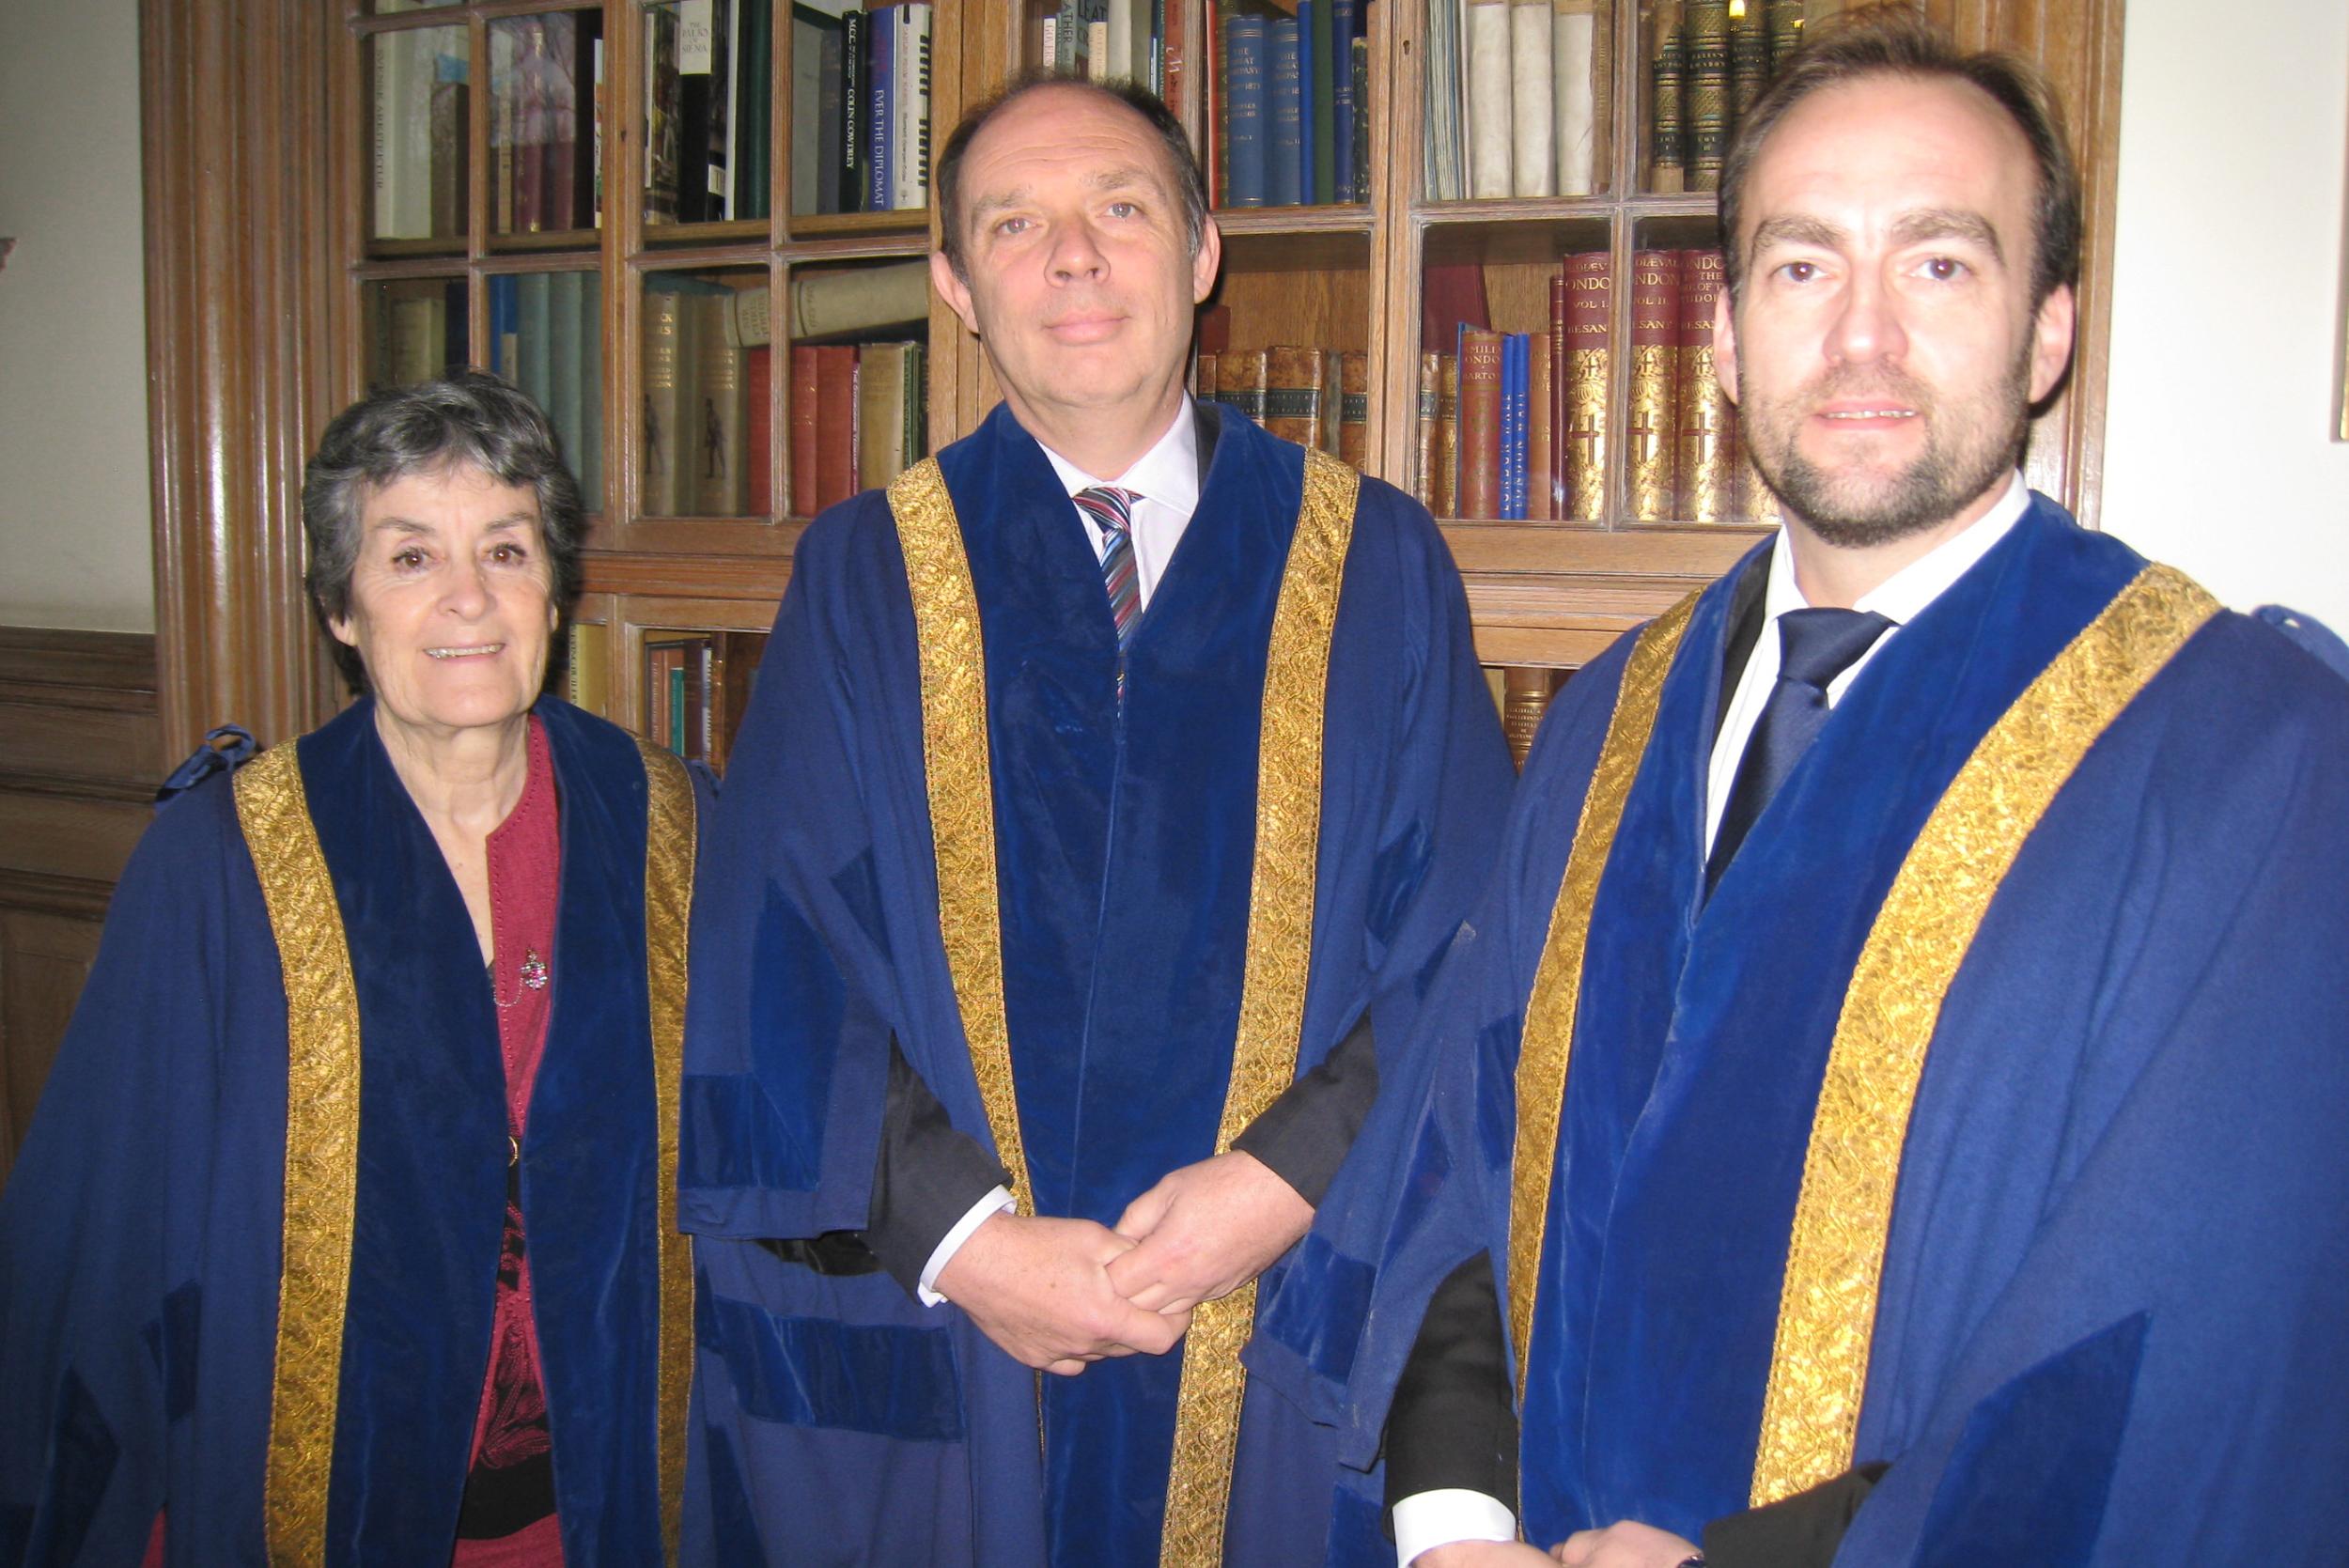 New Liverymen - Dorothy Rochester, Paul Day, Adam Robinson